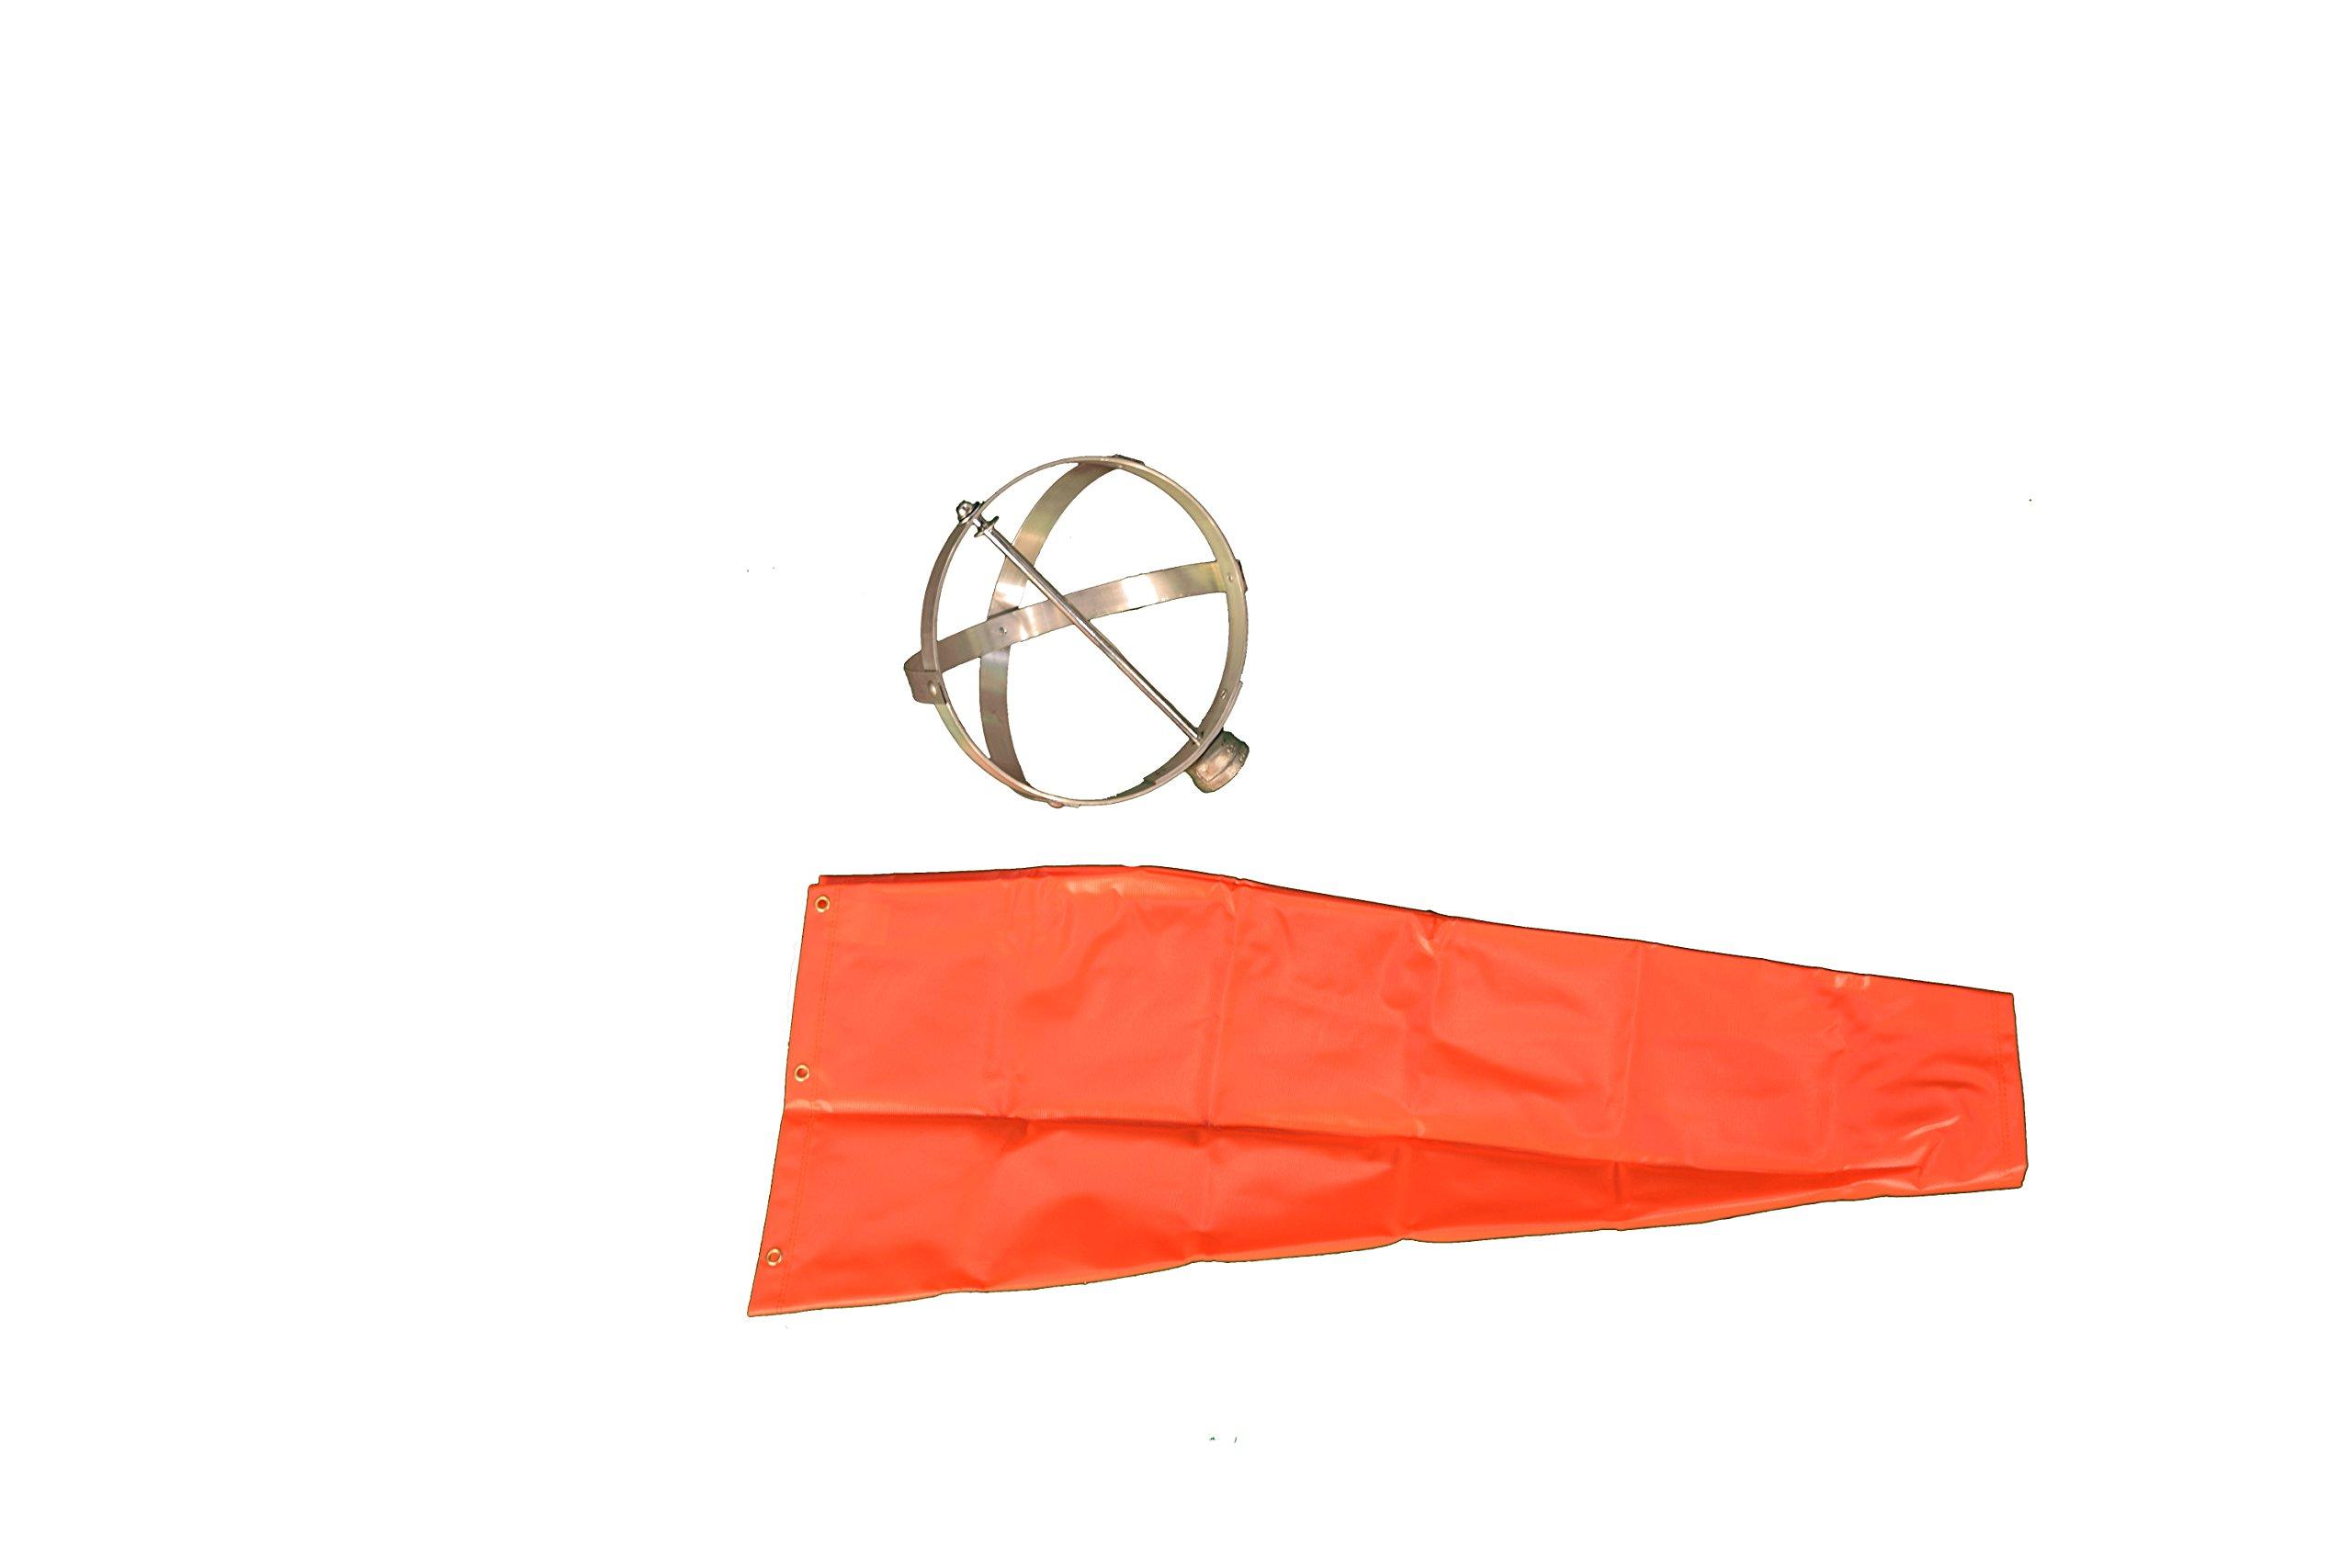 Cortina 03-WS-3KT PVC Over Nylon Windsock Kit, 10'' Diameter x 3' Length, Orange